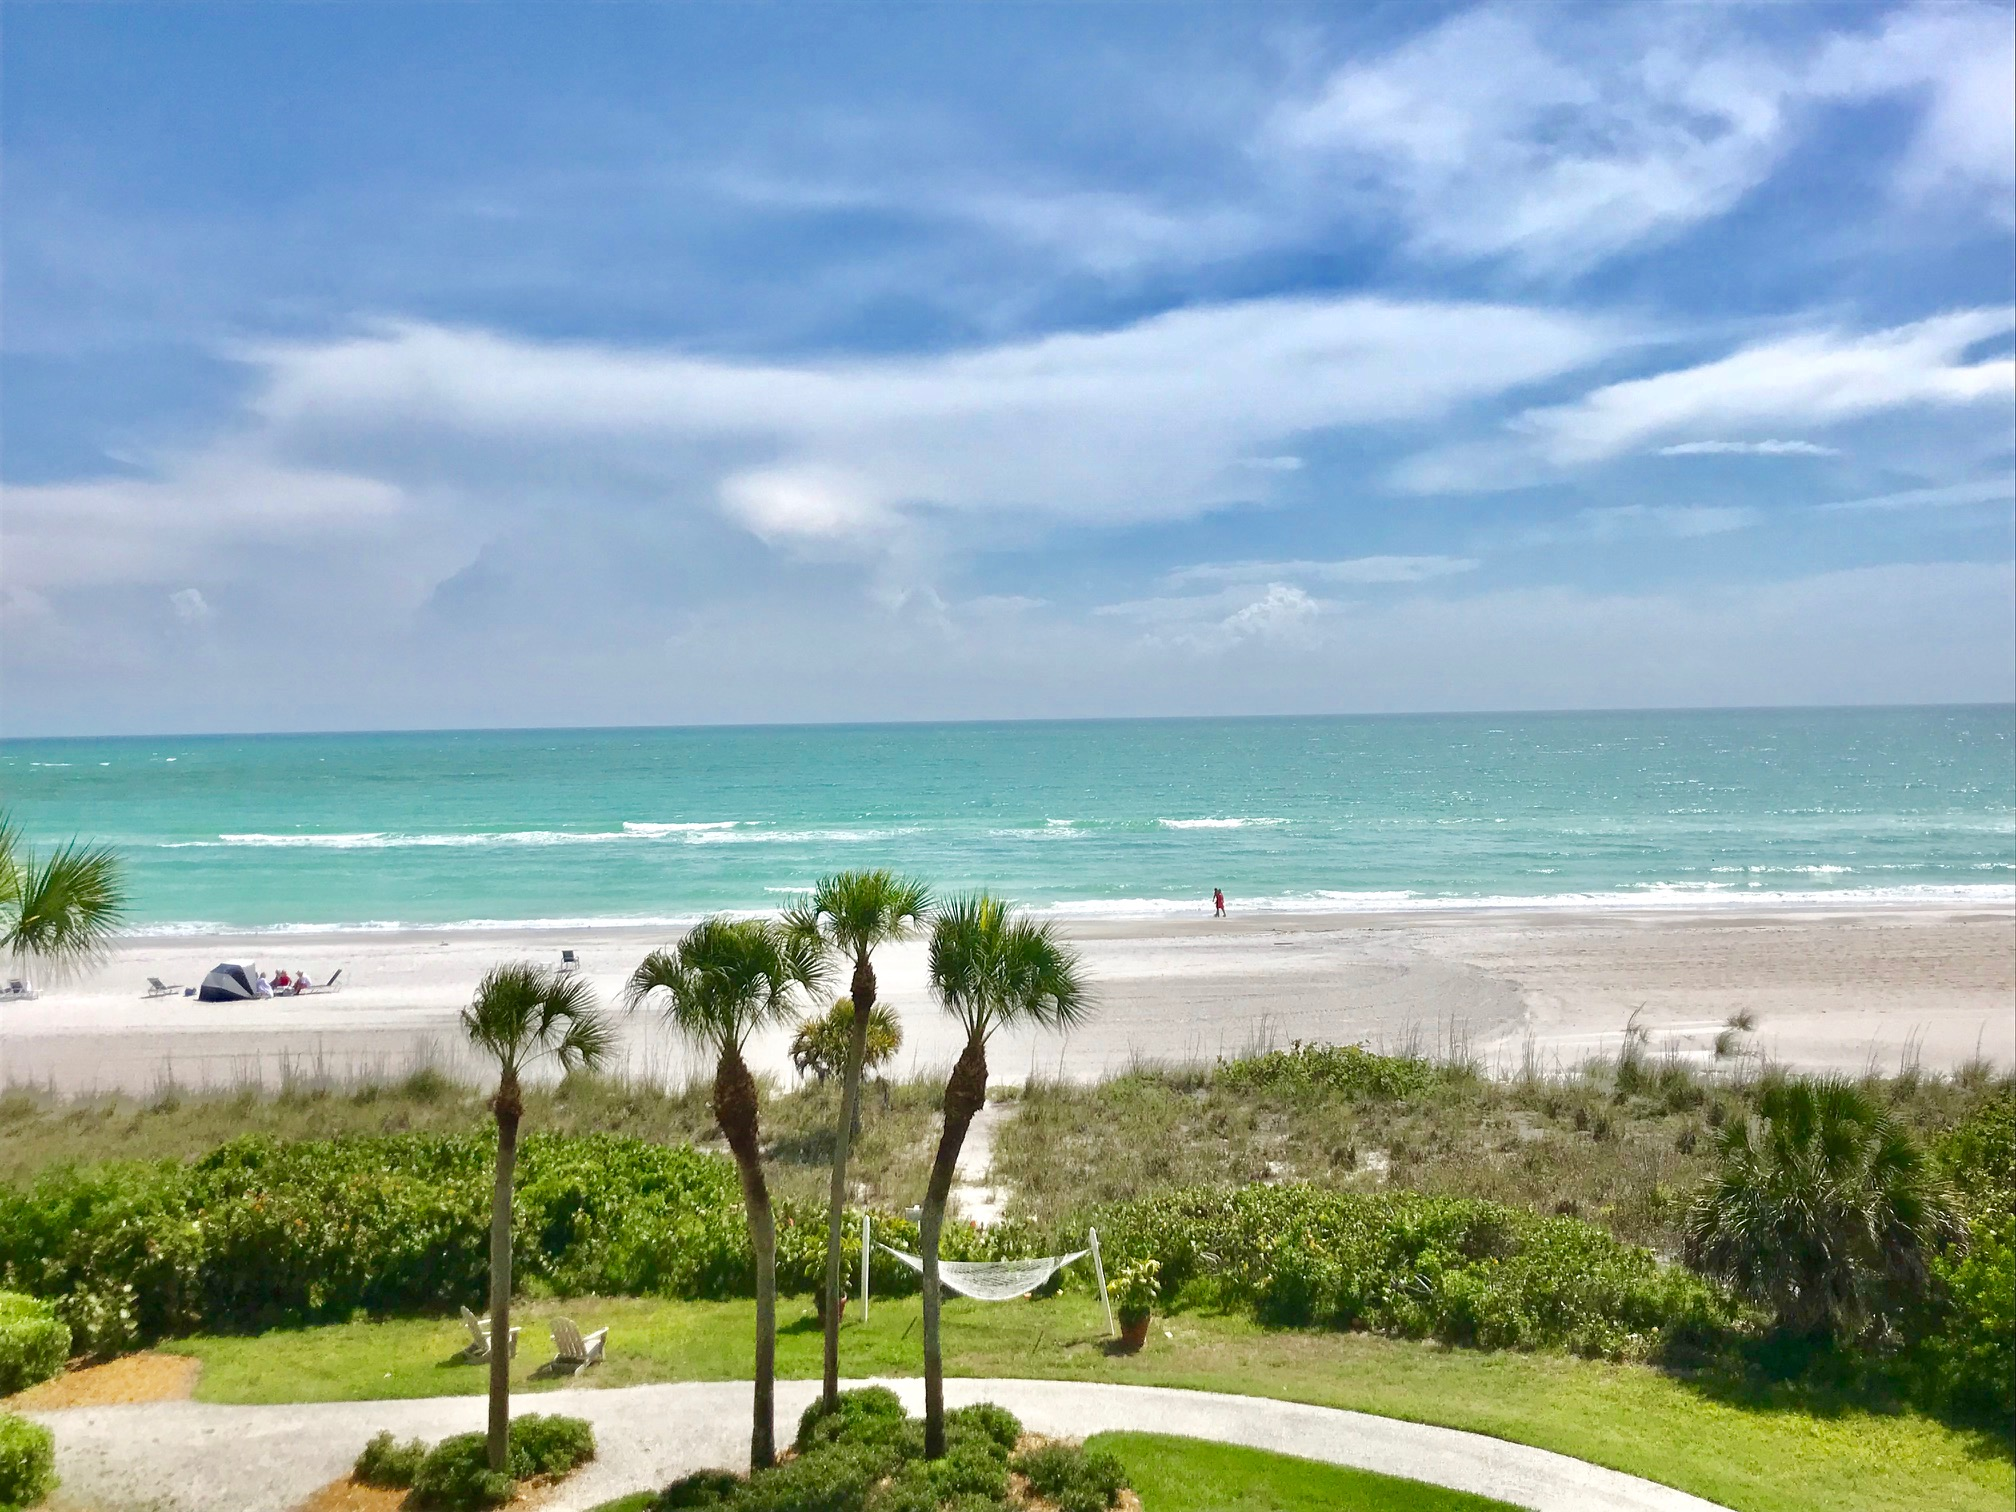 LBK beach view